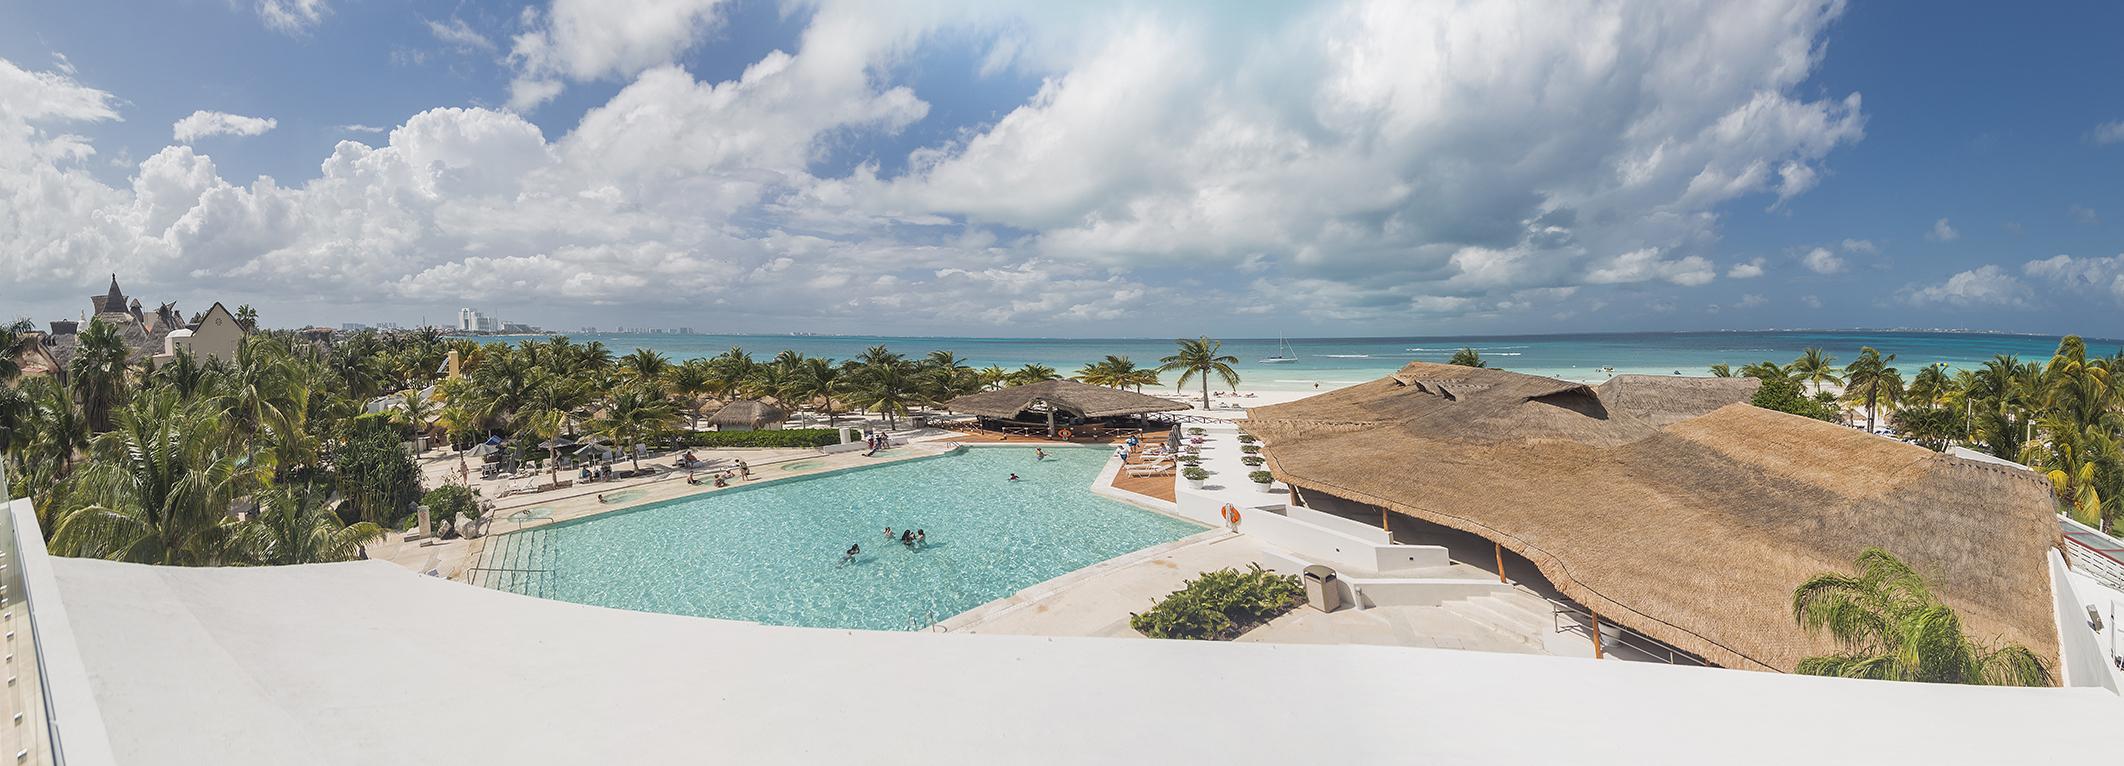 Quintana Roo va por la reconquista de turistas estadounidenses